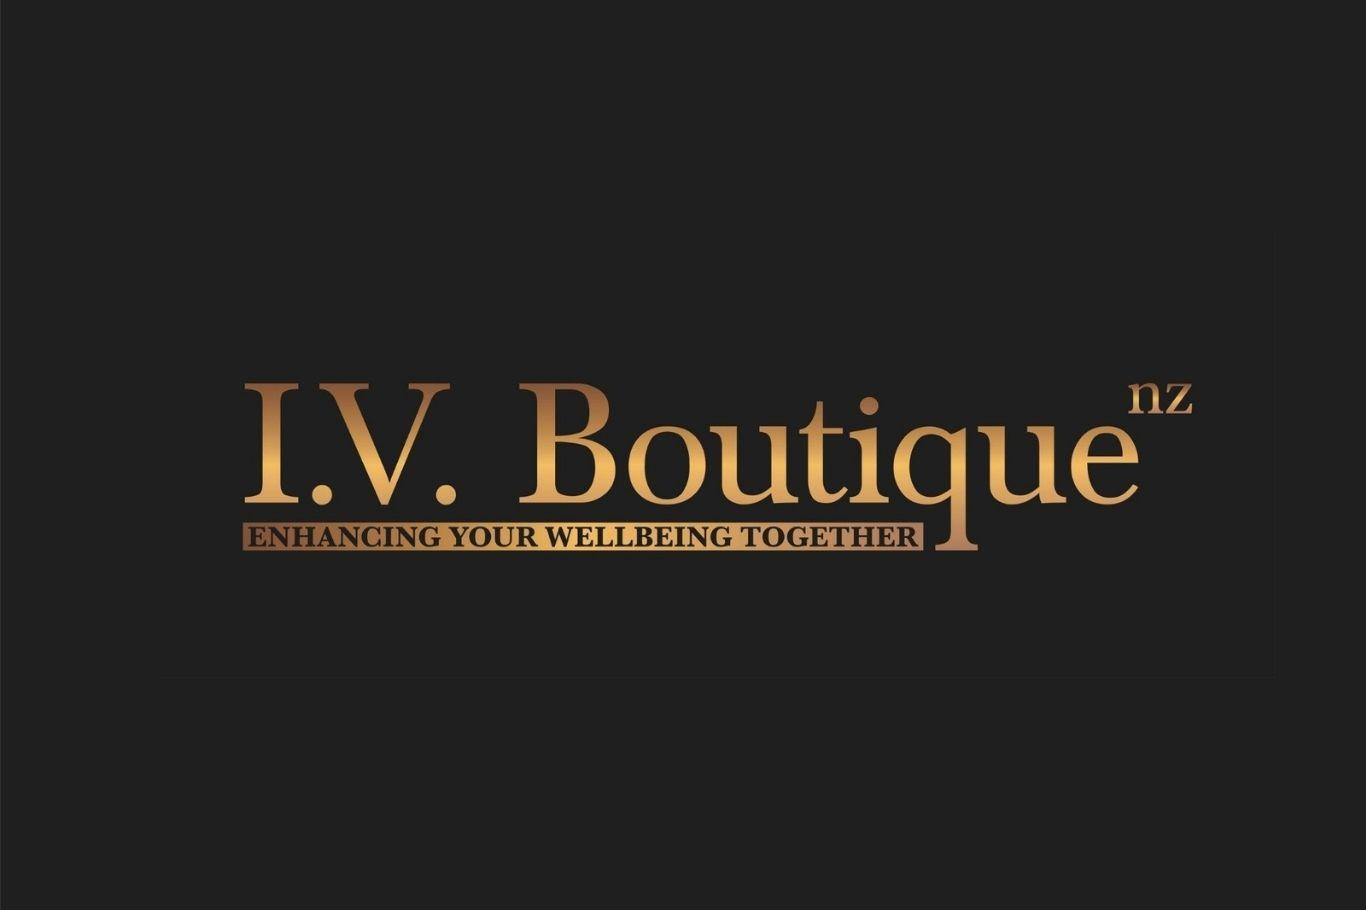 iv boutique brand designing cloud media latest